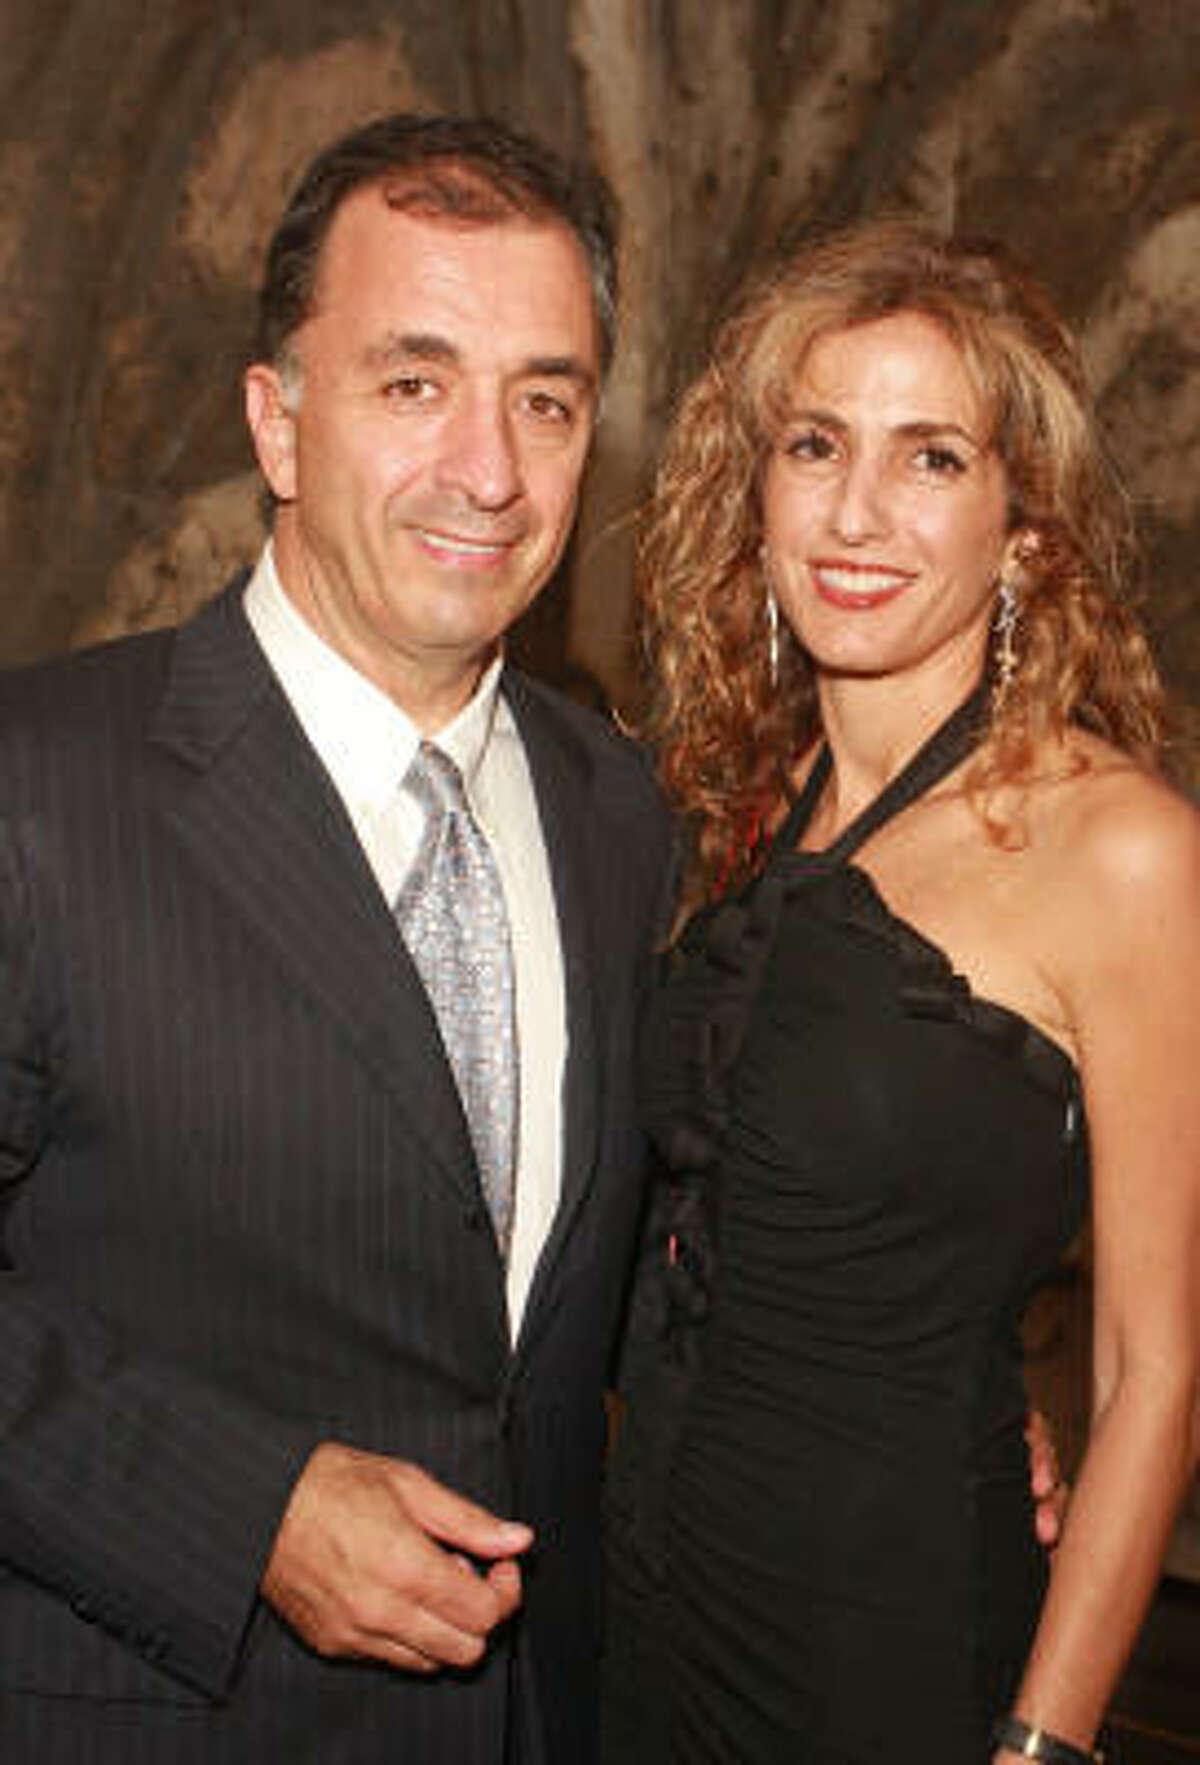 Masoud and Sima Ladjevardian